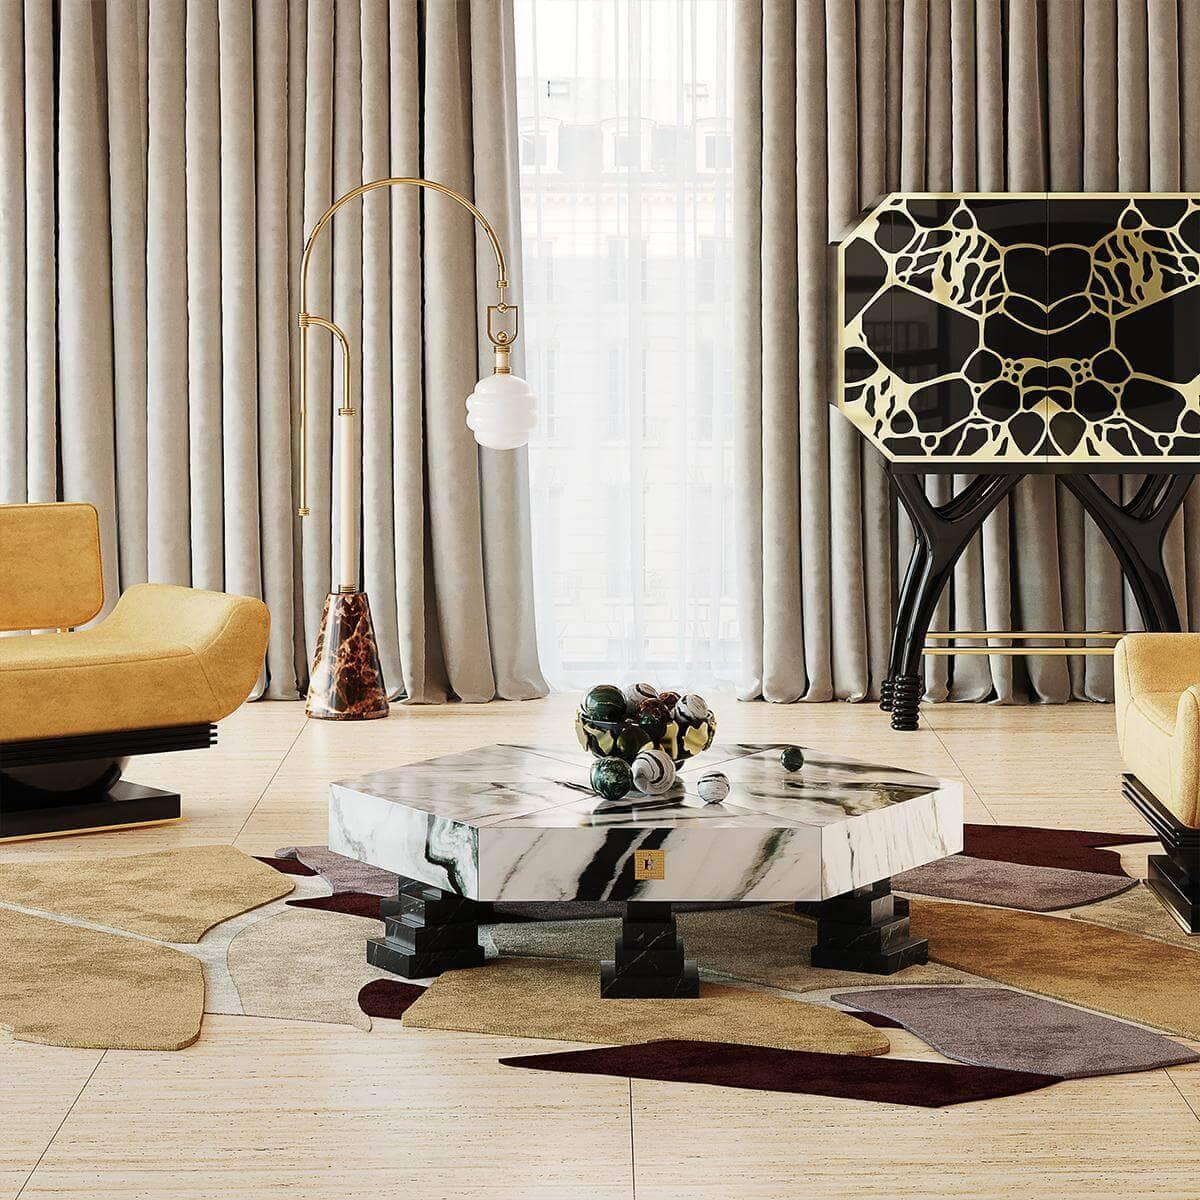 modern italian lexicon, modern italian furniture design style